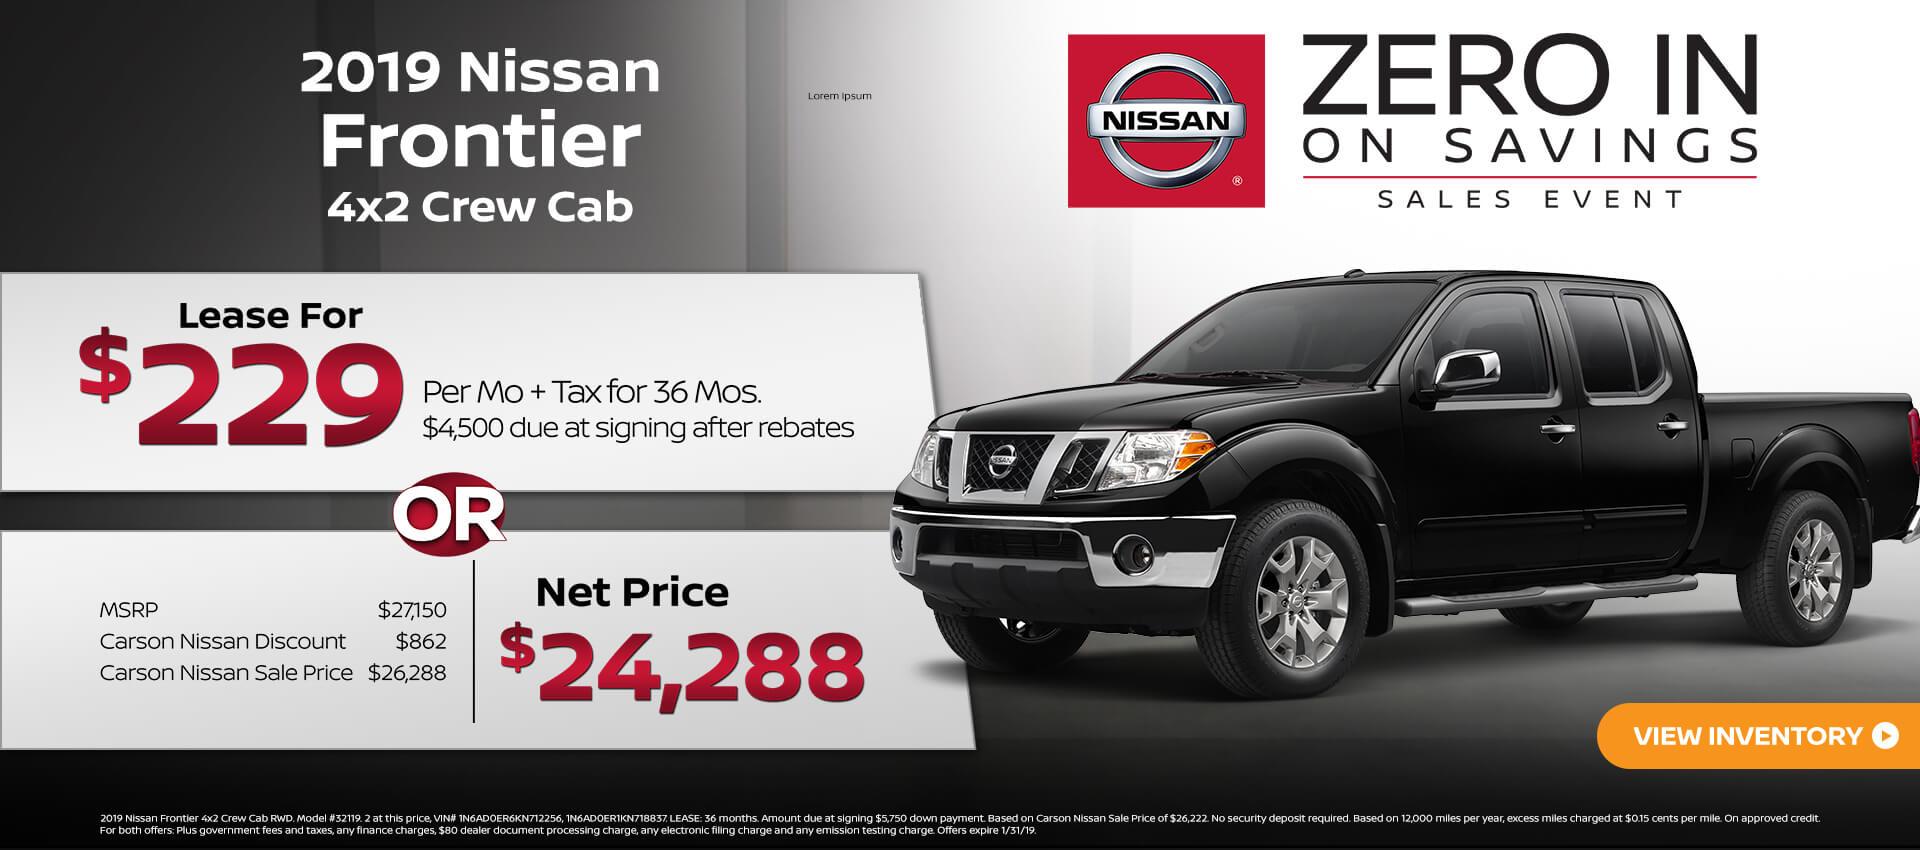 2019 Nissan Frontier 4x2 CC